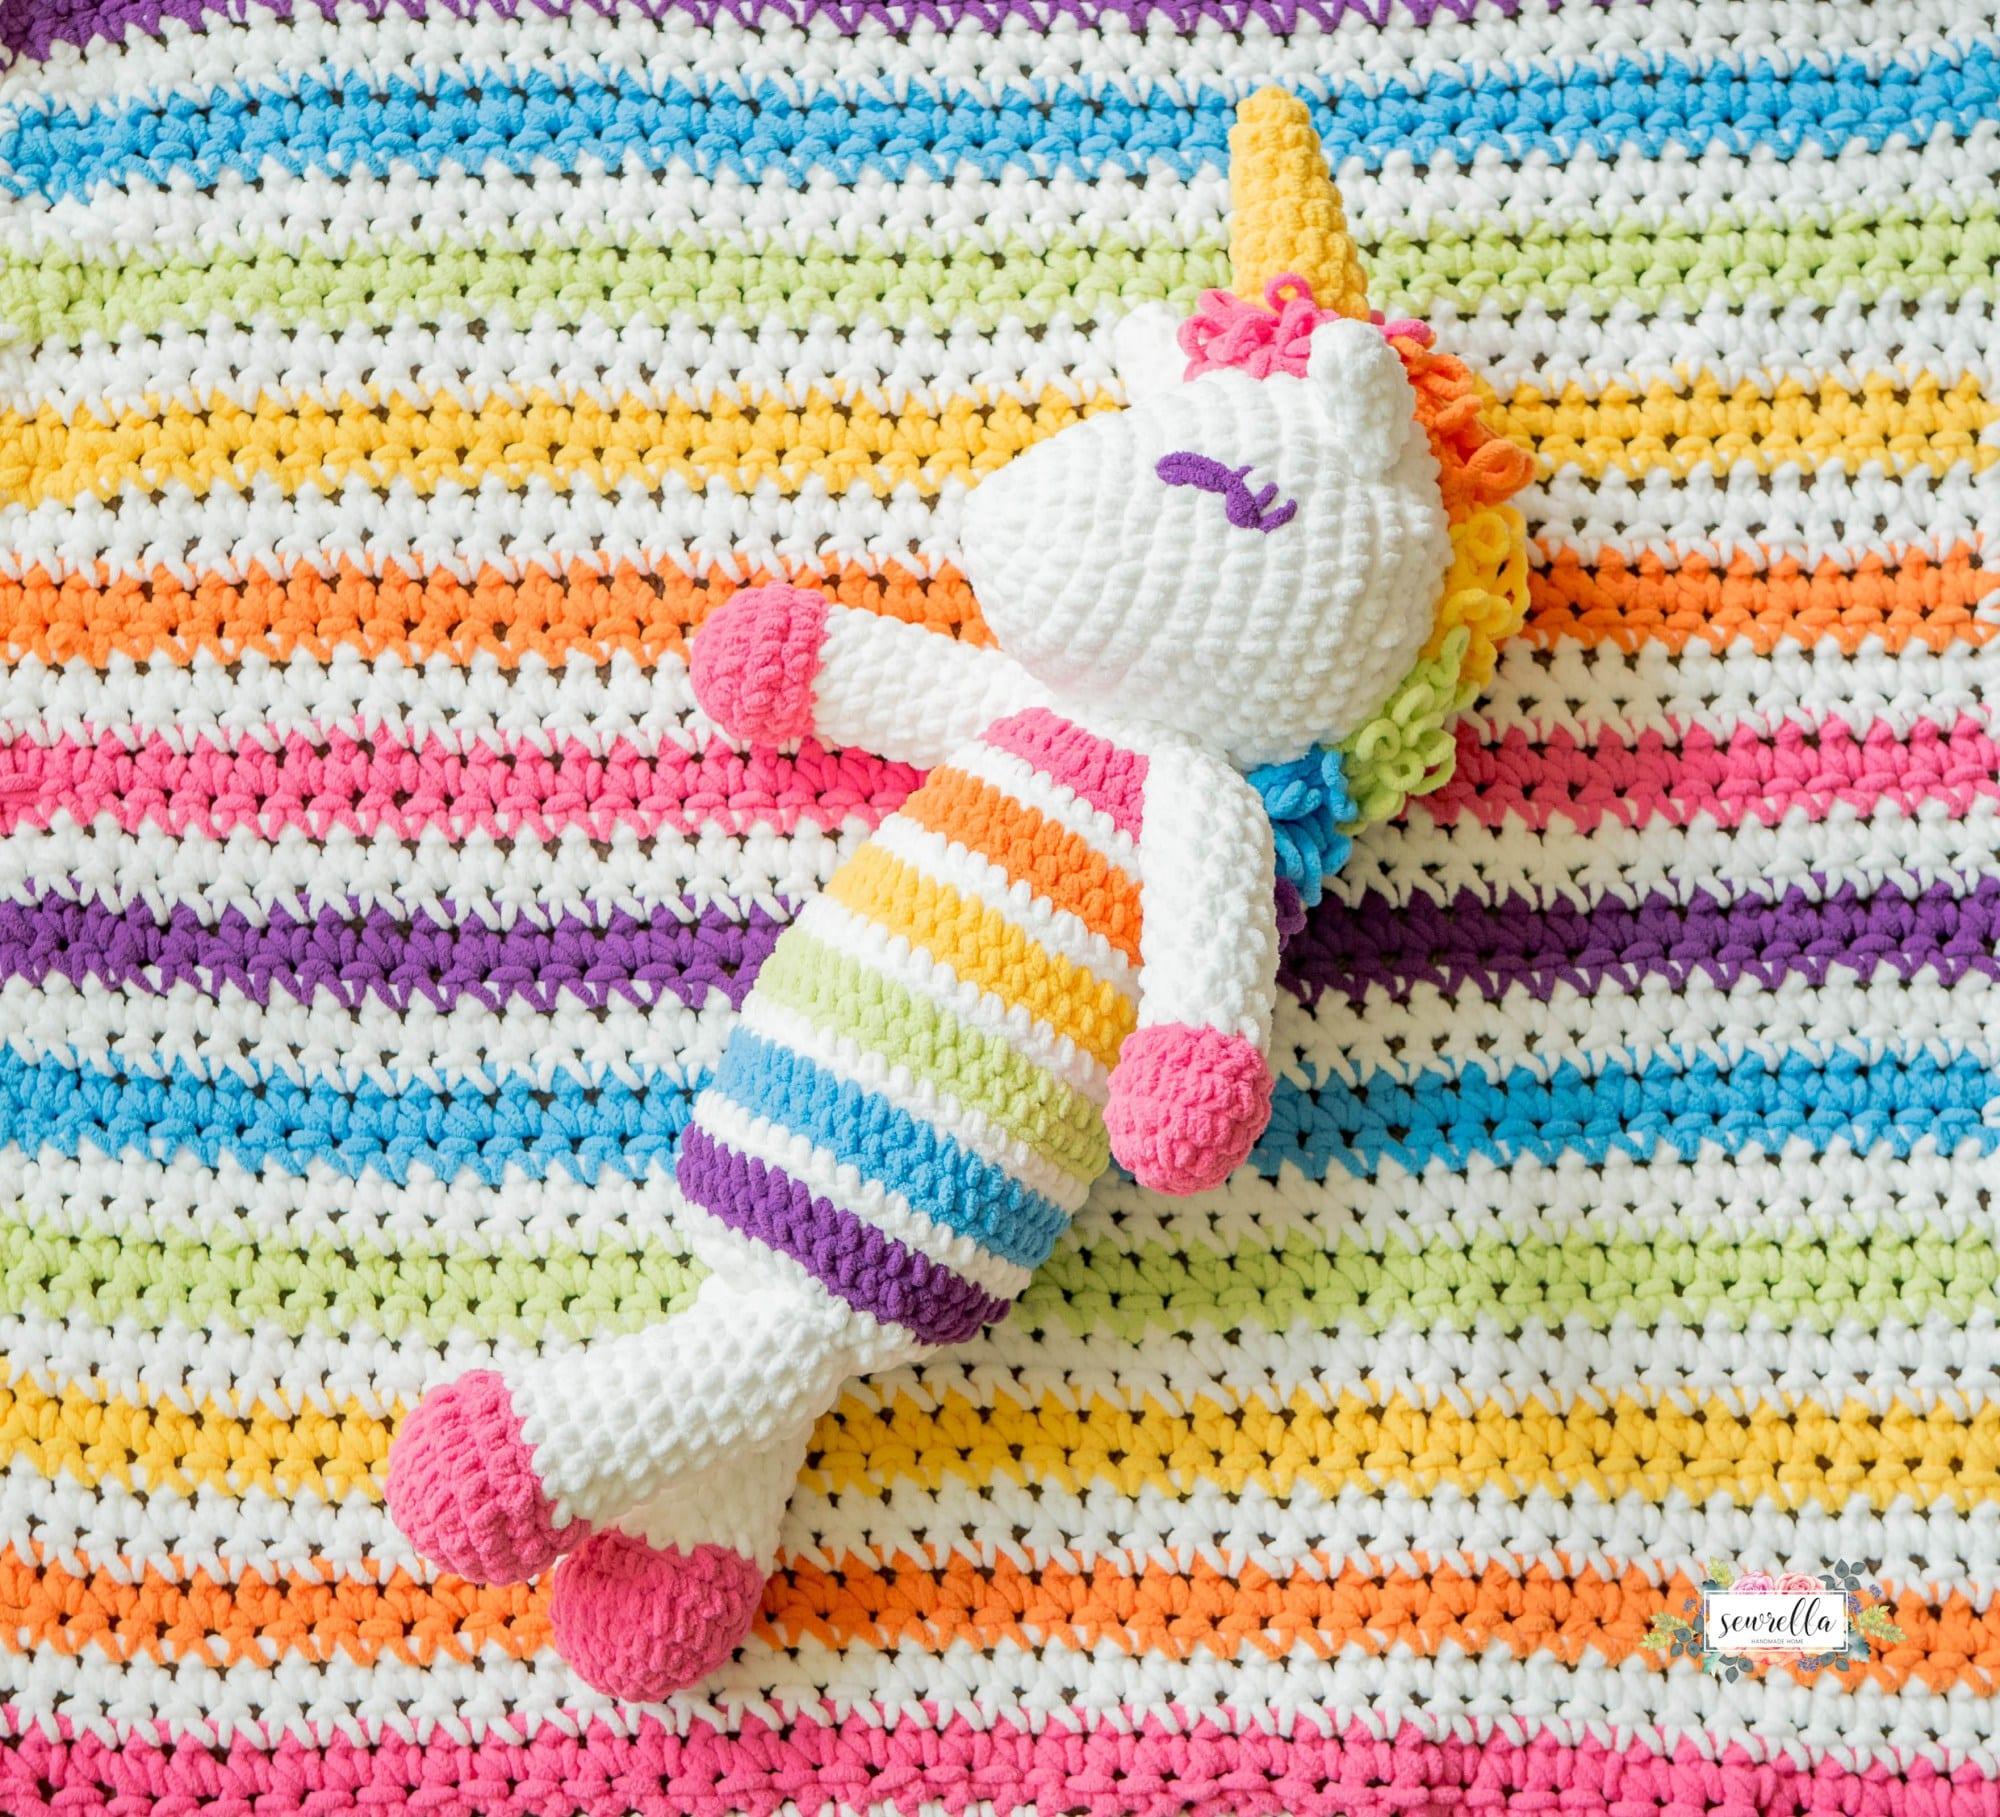 Crochet Rainbow Baby Free Pattern Roundup - Sewrella